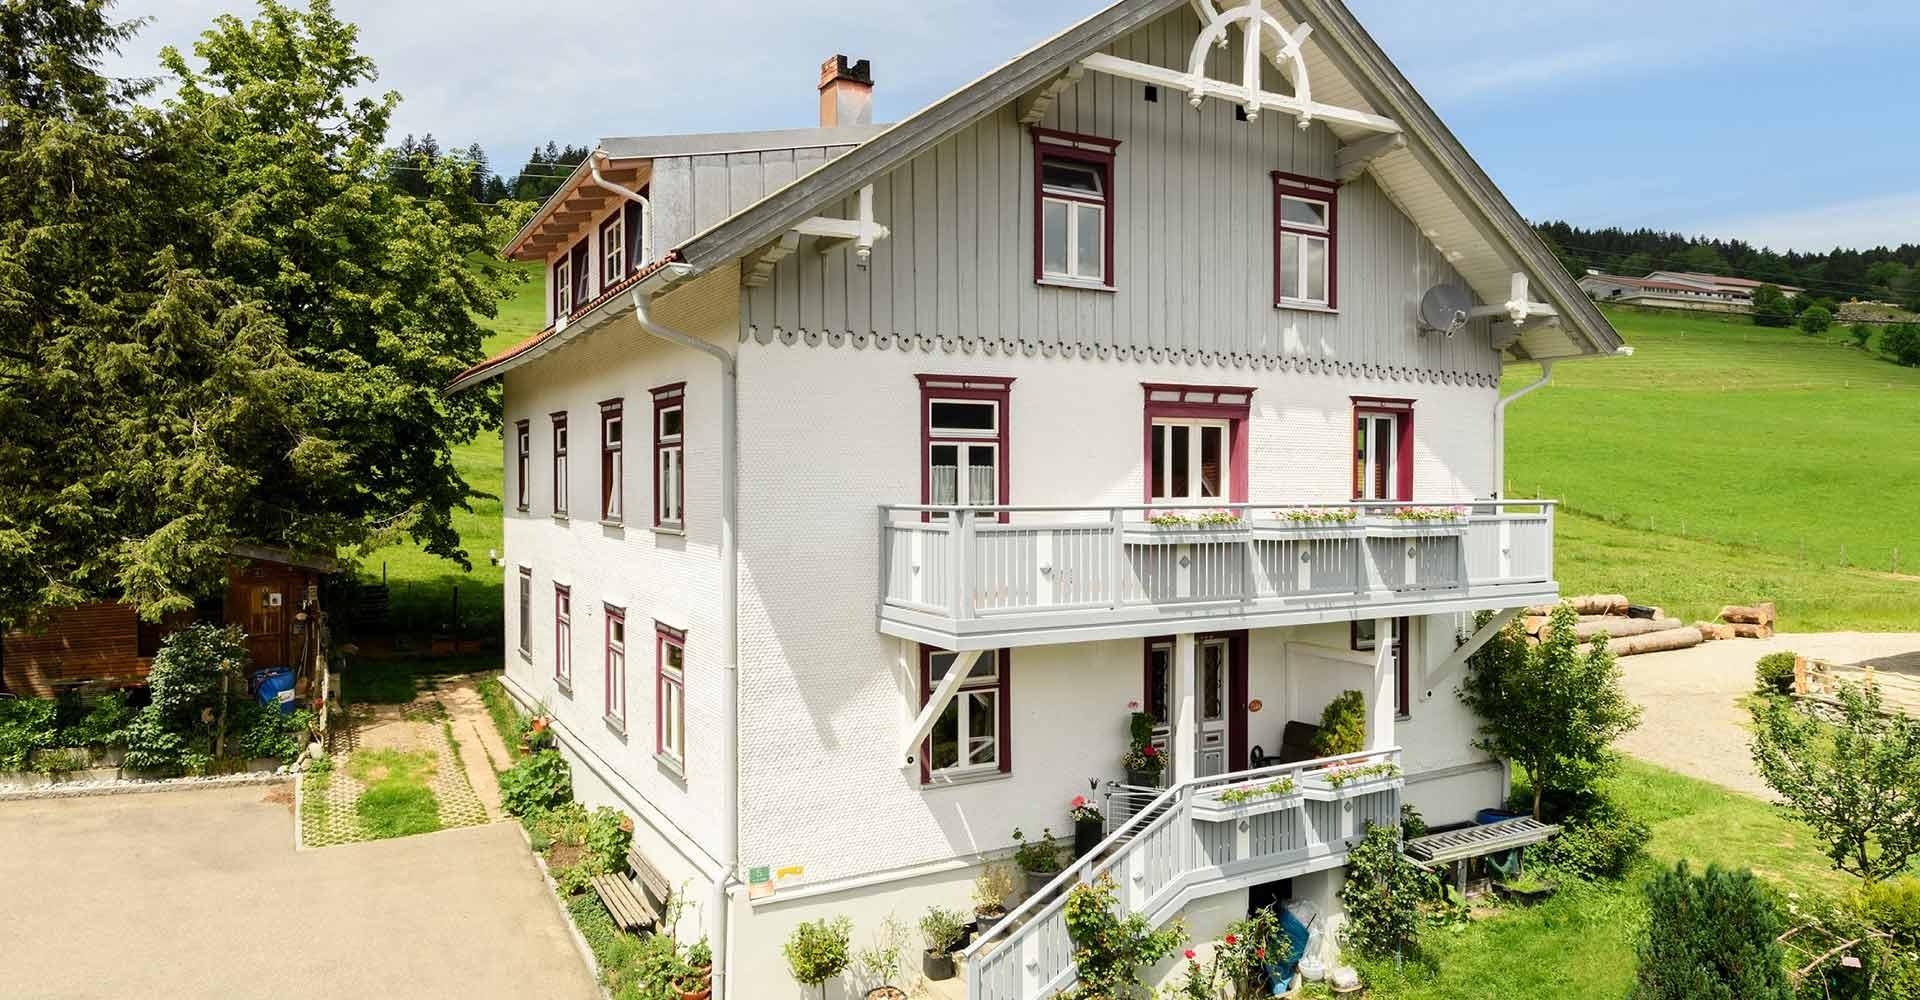 fewo-gebhardshoehe-rettenberg-allgaeu65183E5A-7861-29D0-0166-733694B5493E.jpg